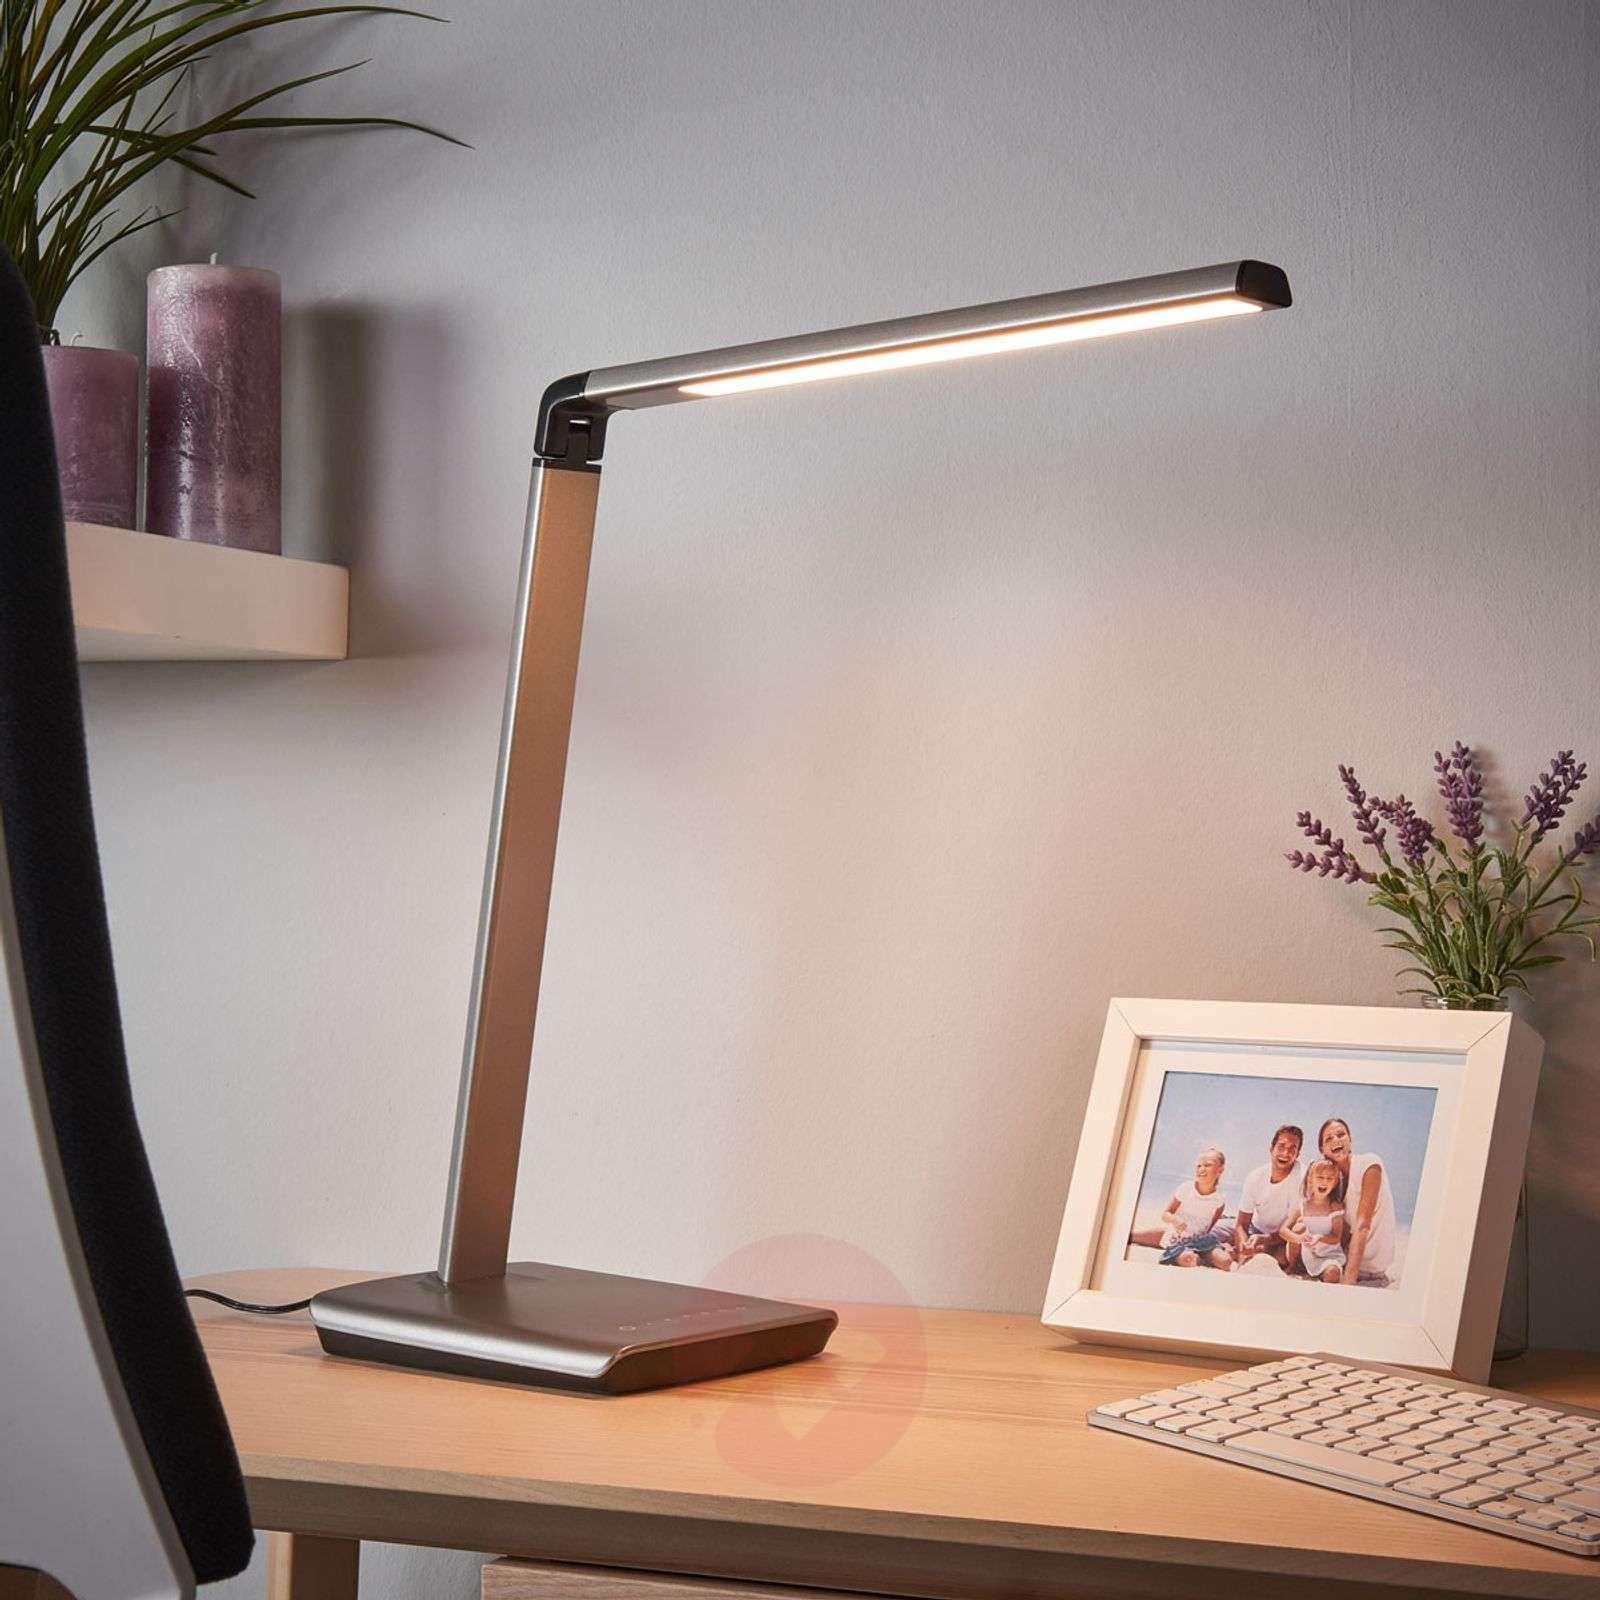 Metallic grey LED table lamp Kuno with dimmer, USB-9643036-02